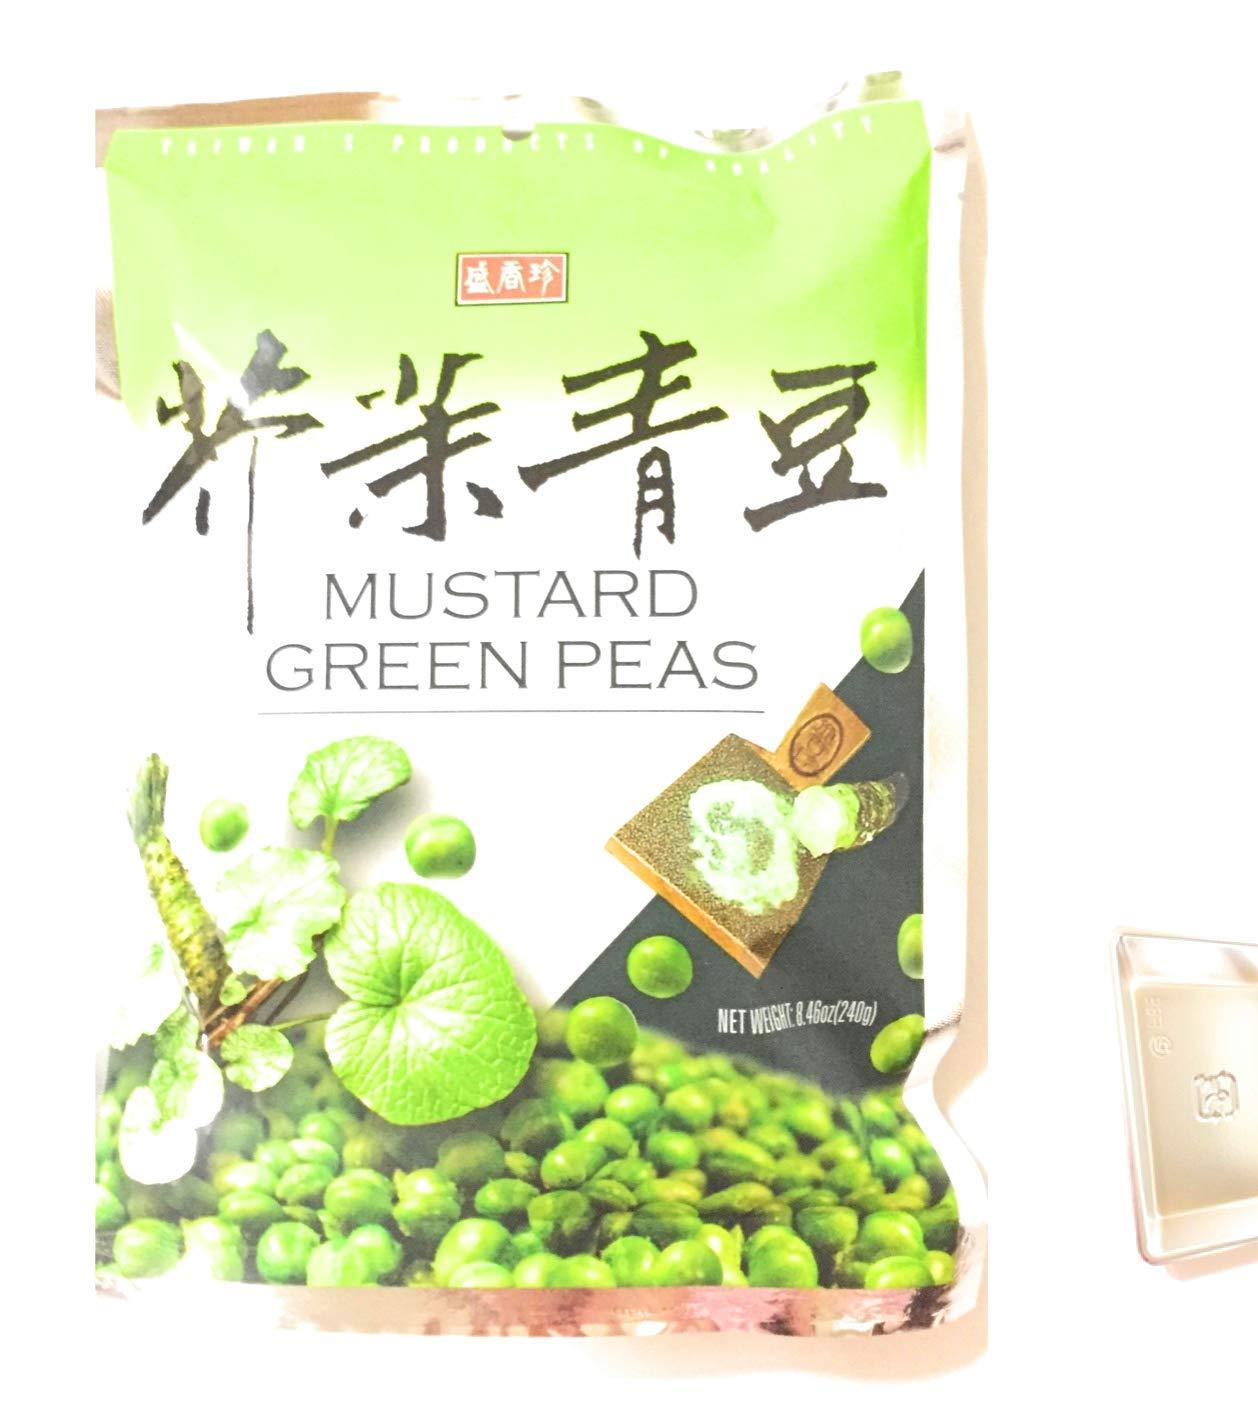 Sheng Xiang Zhen Mustard Green Peas 1 Pack Memphis Mall I And Dealing full price reduction Sa 8.46 Oz Soy